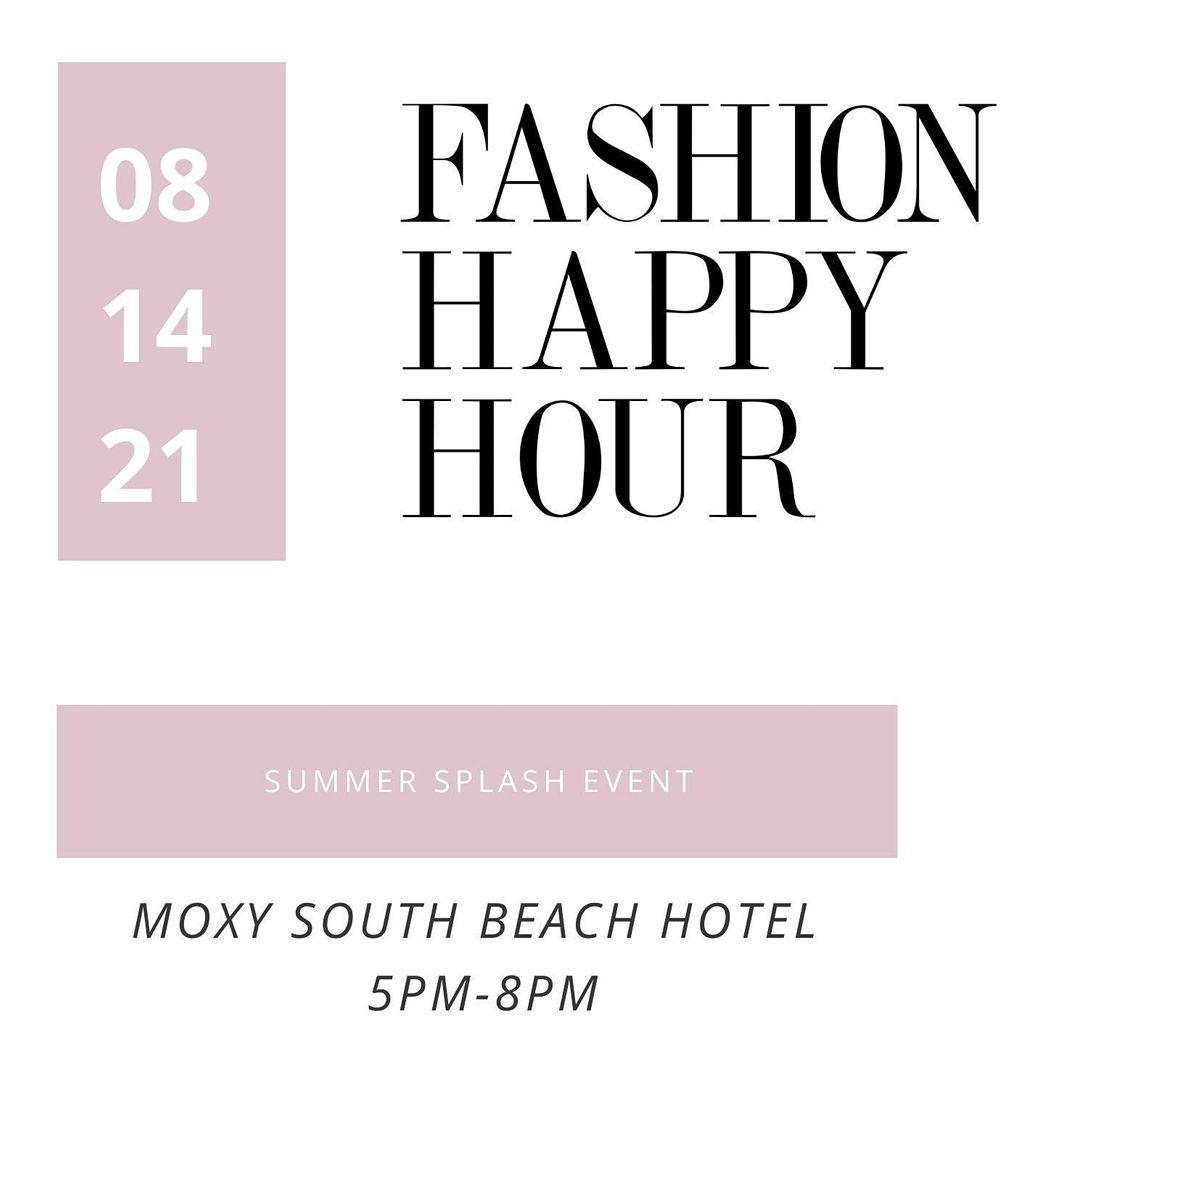 Fashion Happy Hour Summer Splash at Moxy South Beach